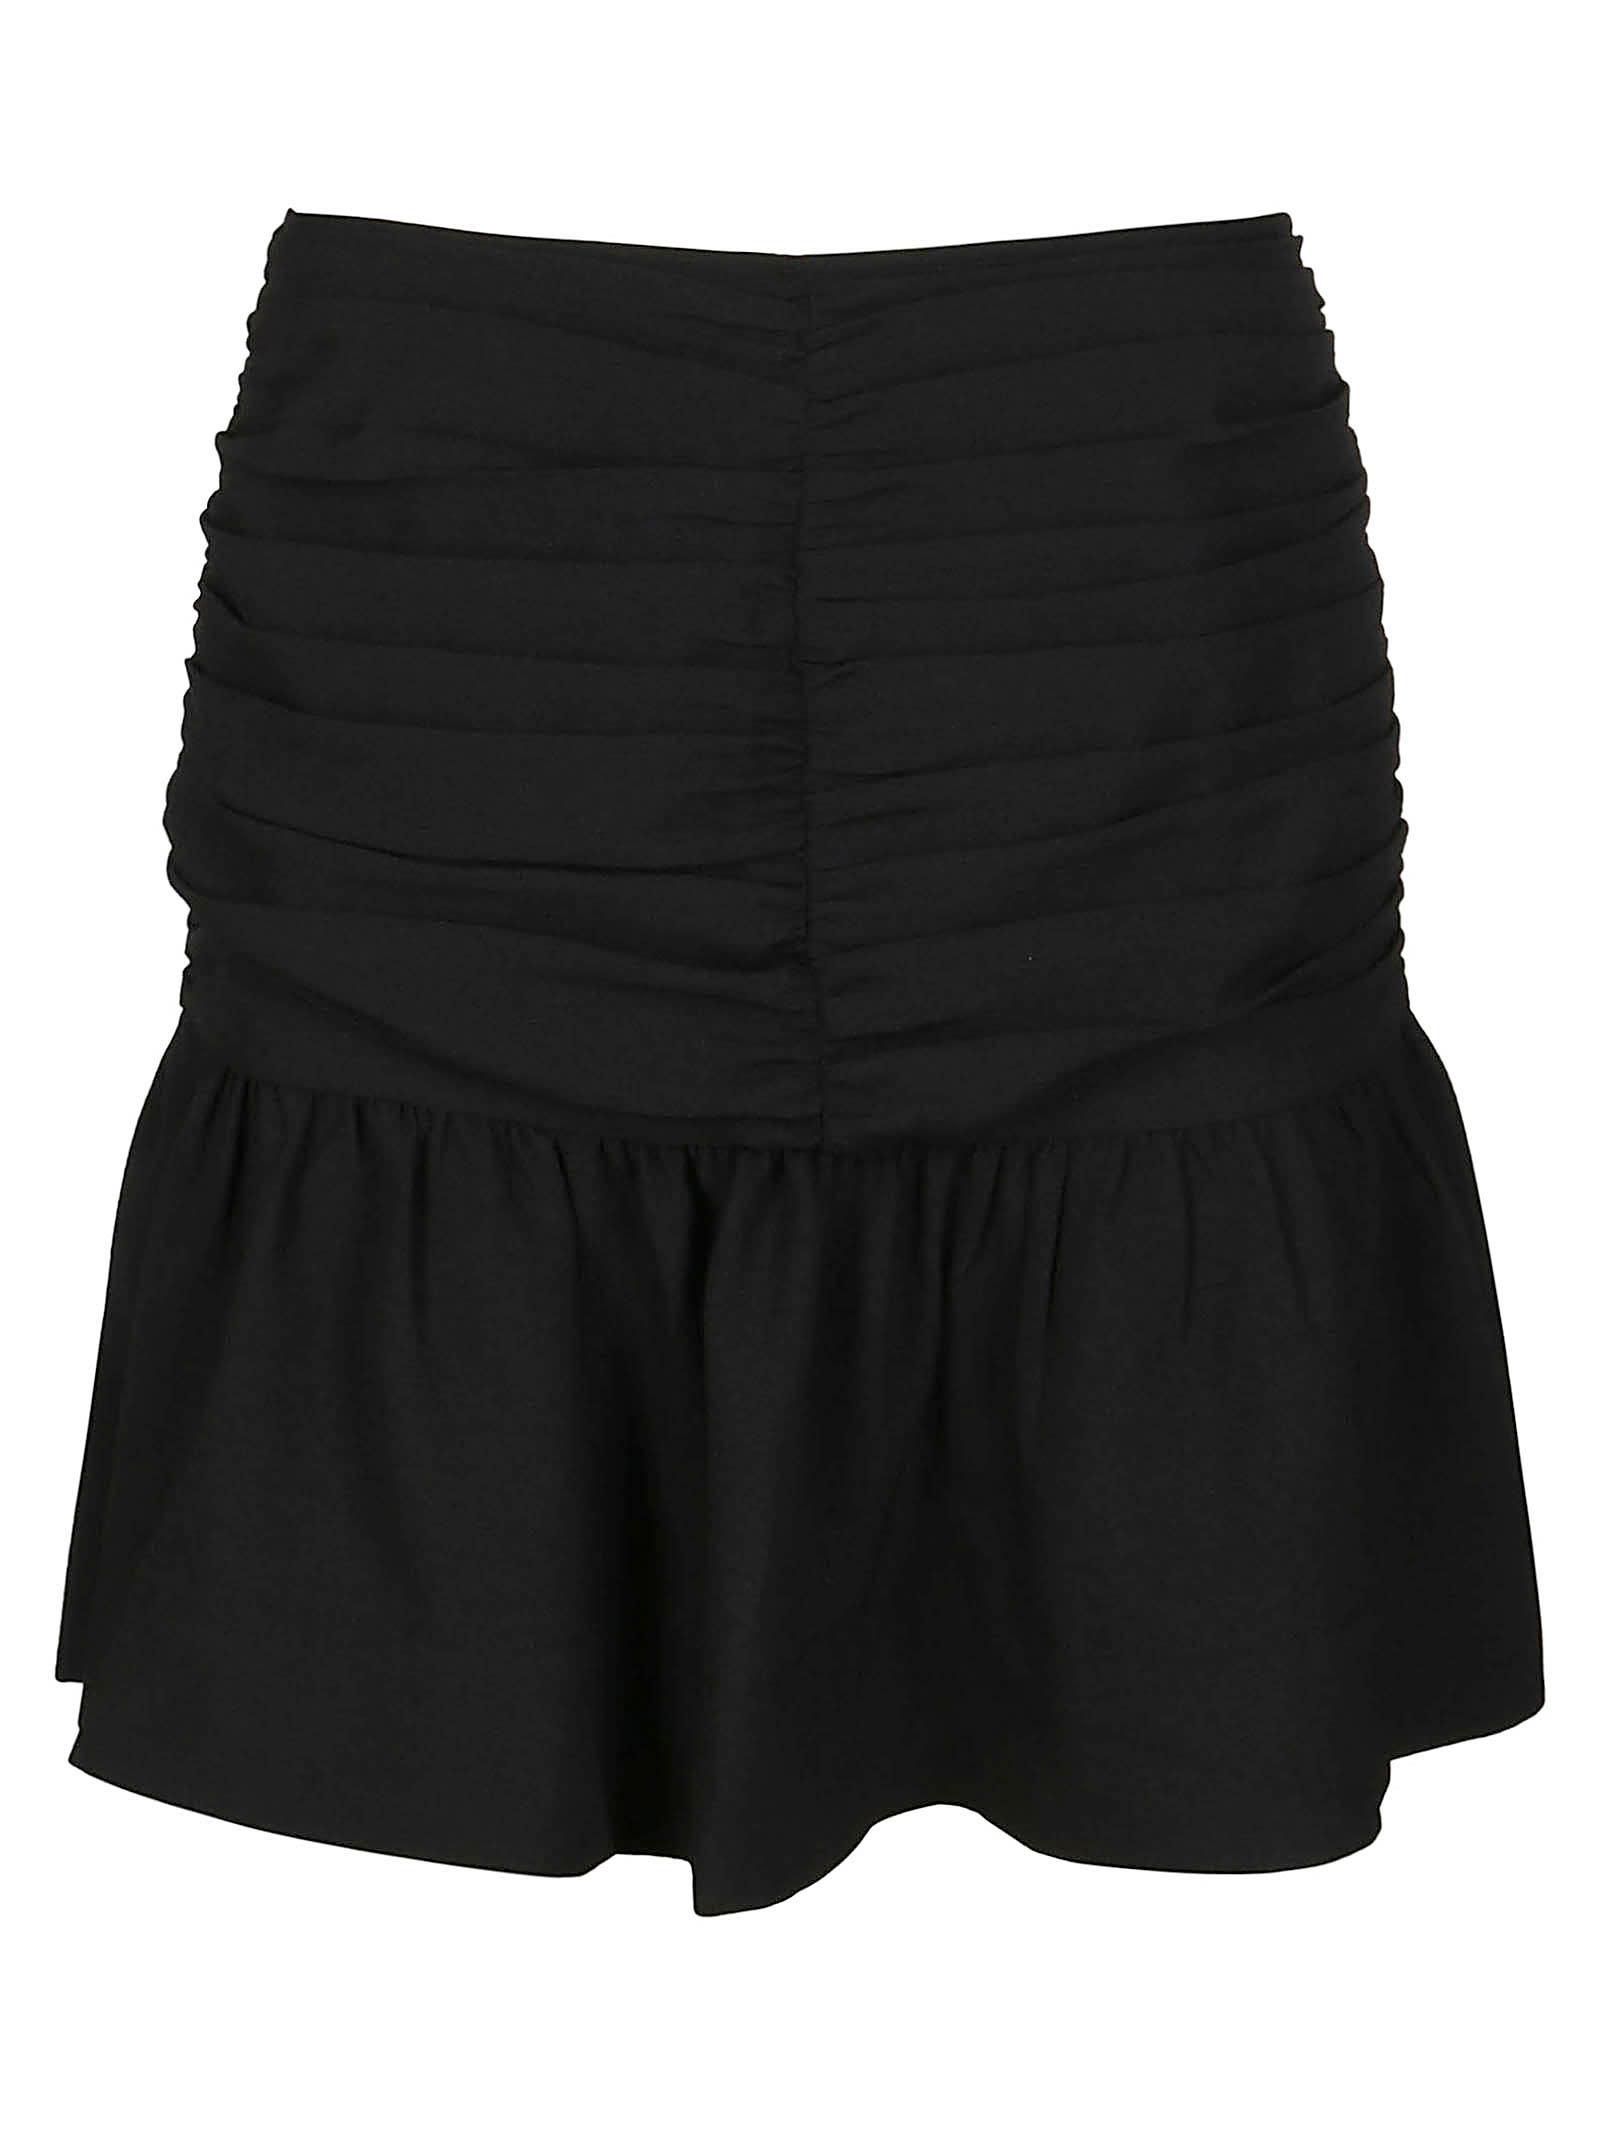 Ganni Mini skirts BLACK MINI SKIRT